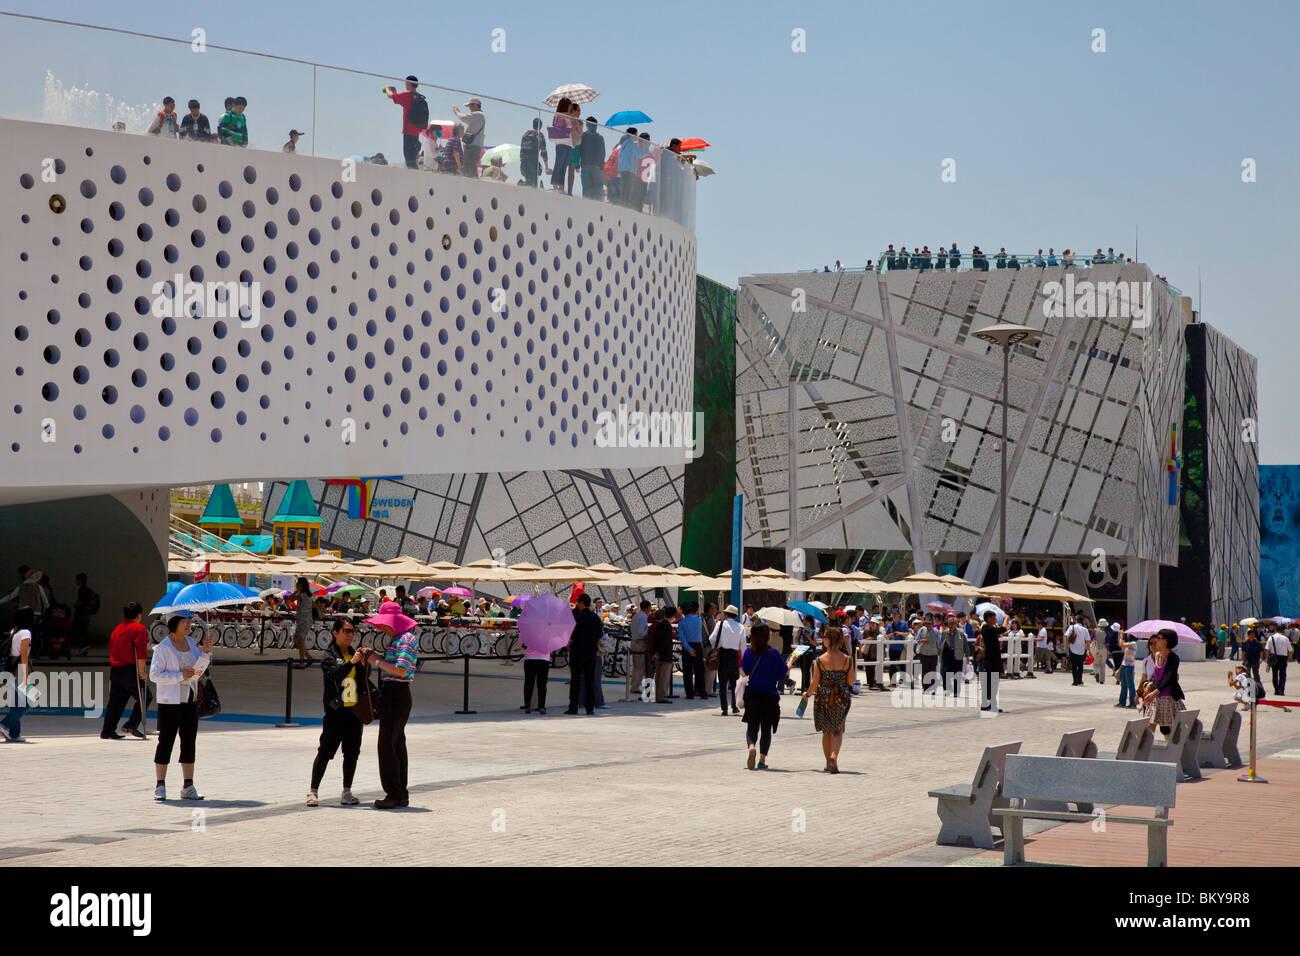 Denmark and Sweden Pavillion at Expo 2010, Shanghai, China World's Fair - Stock Image